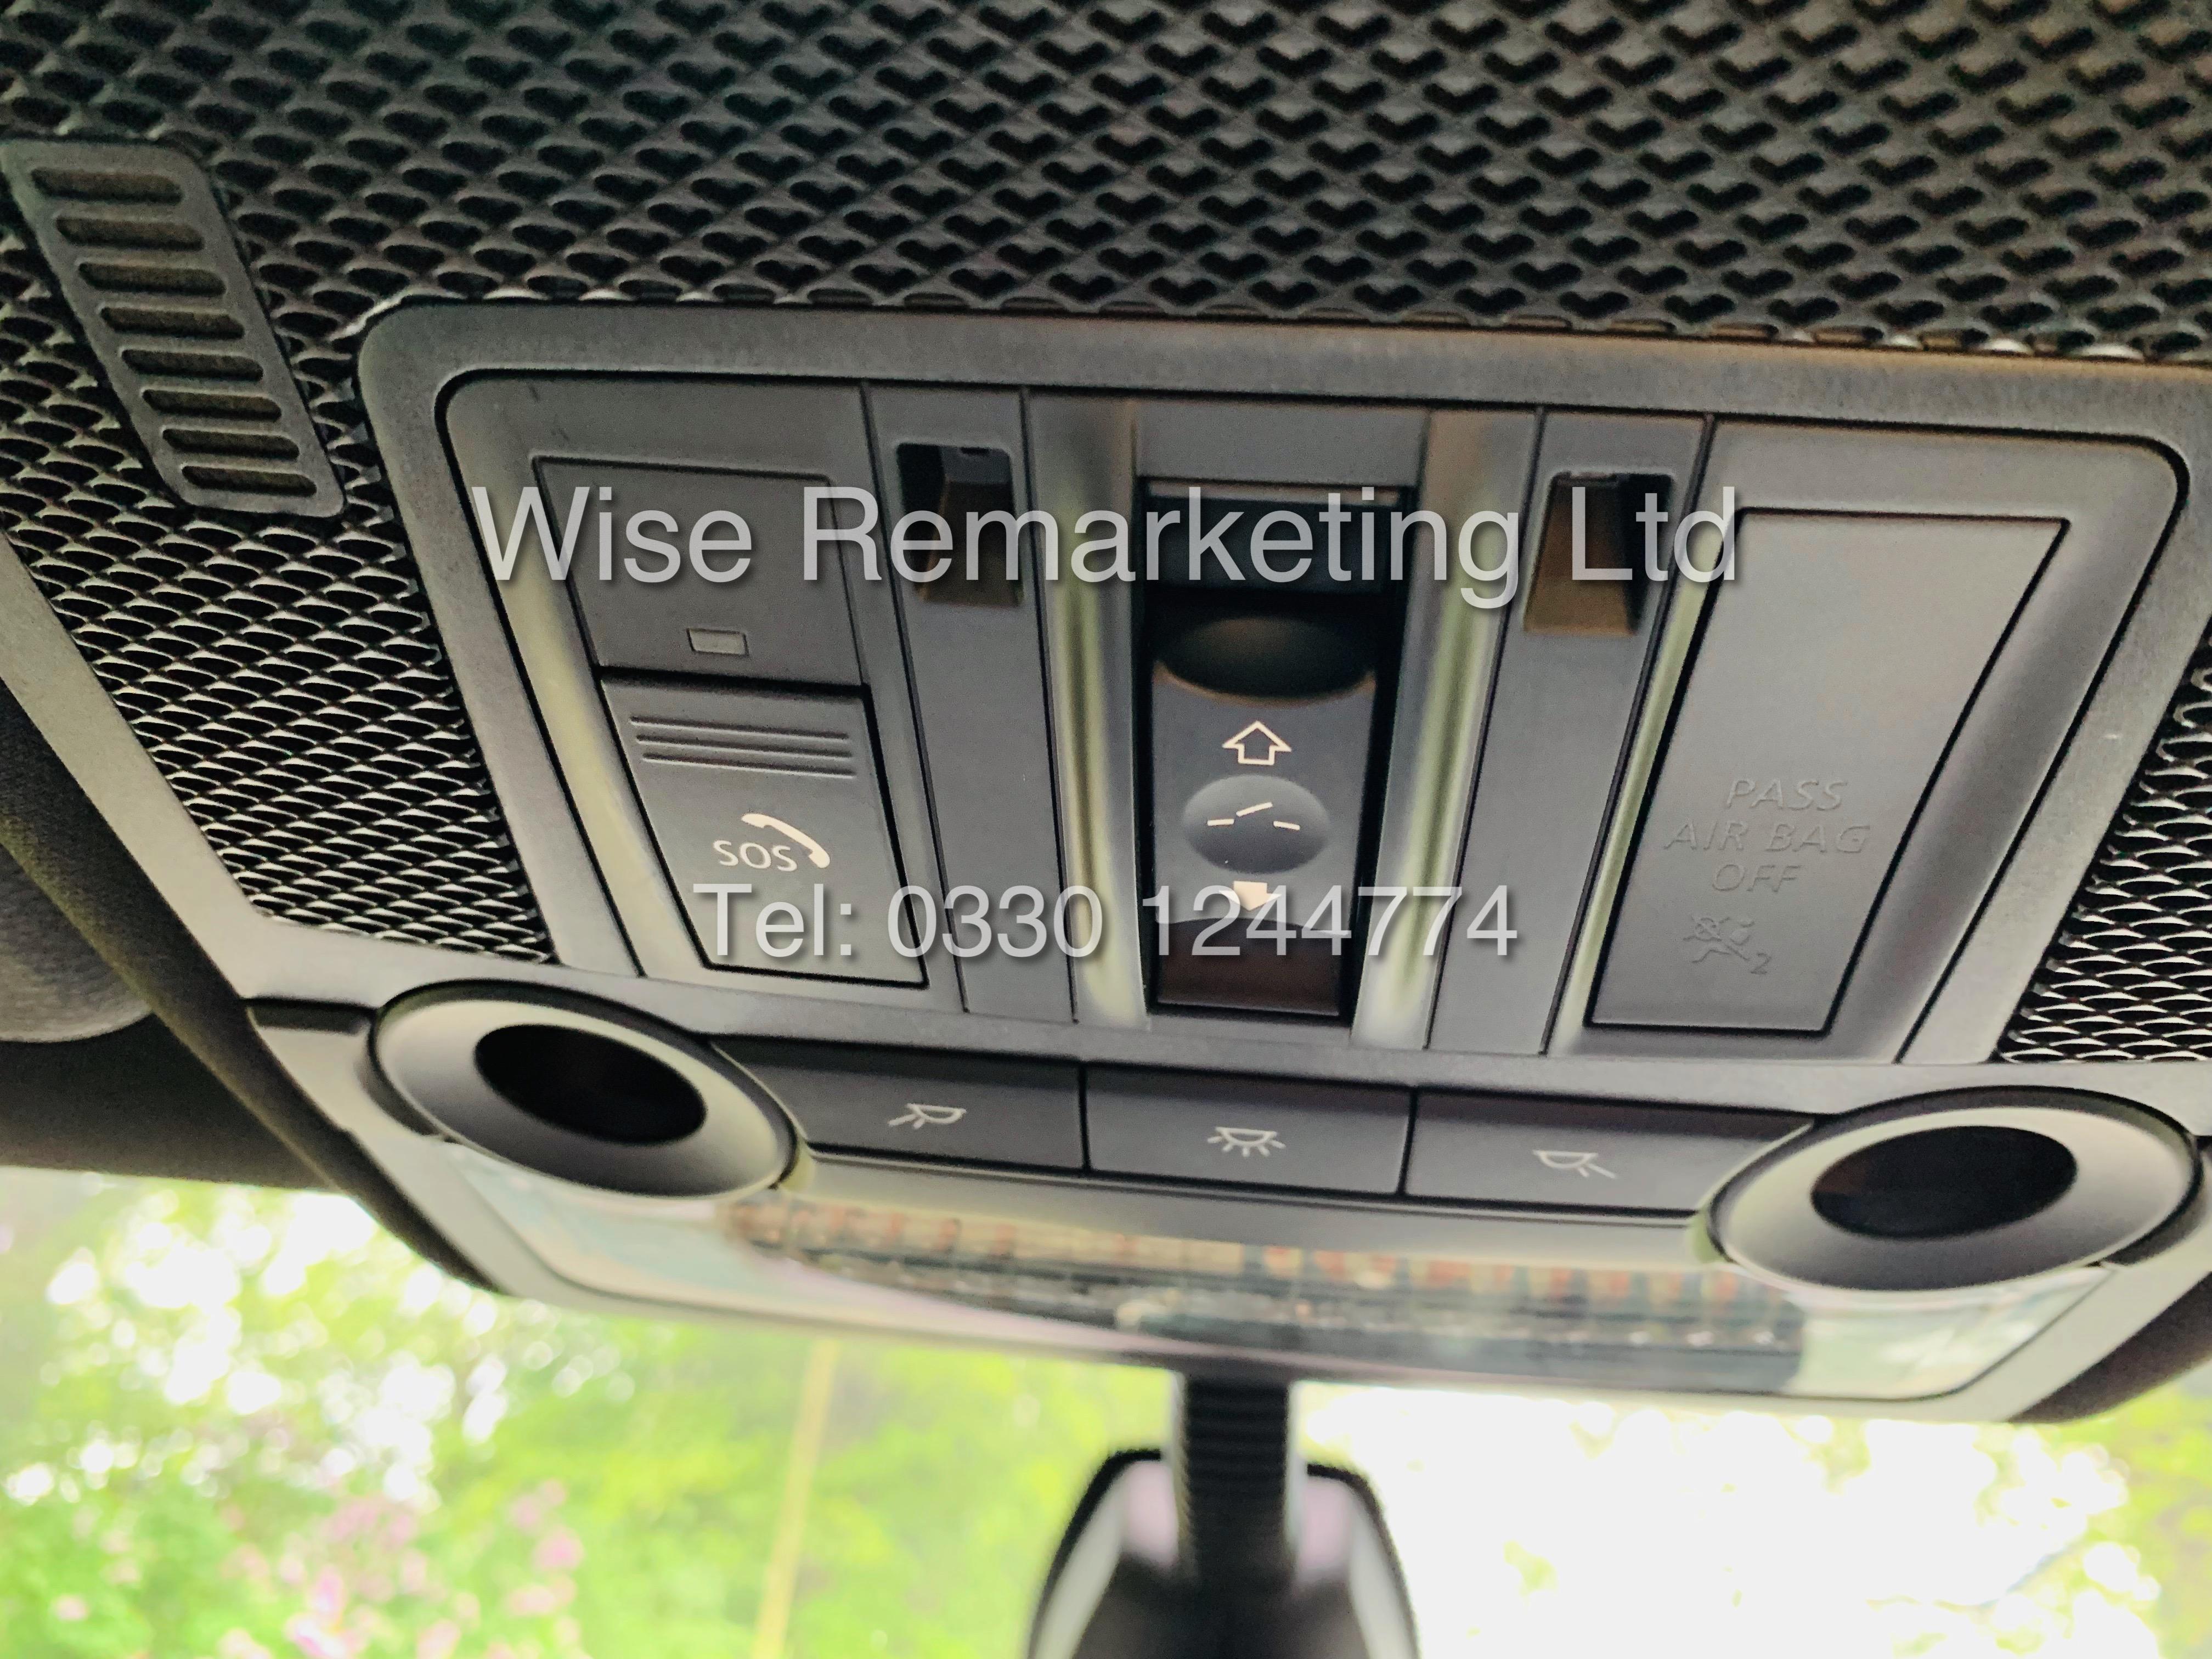 BMW X6 XDRIVE 35D AUTO (2009 SPEC) *1 PREVIOUS OWNER* PARKING AID - SAT NAV - FSH - Image 21 of 25